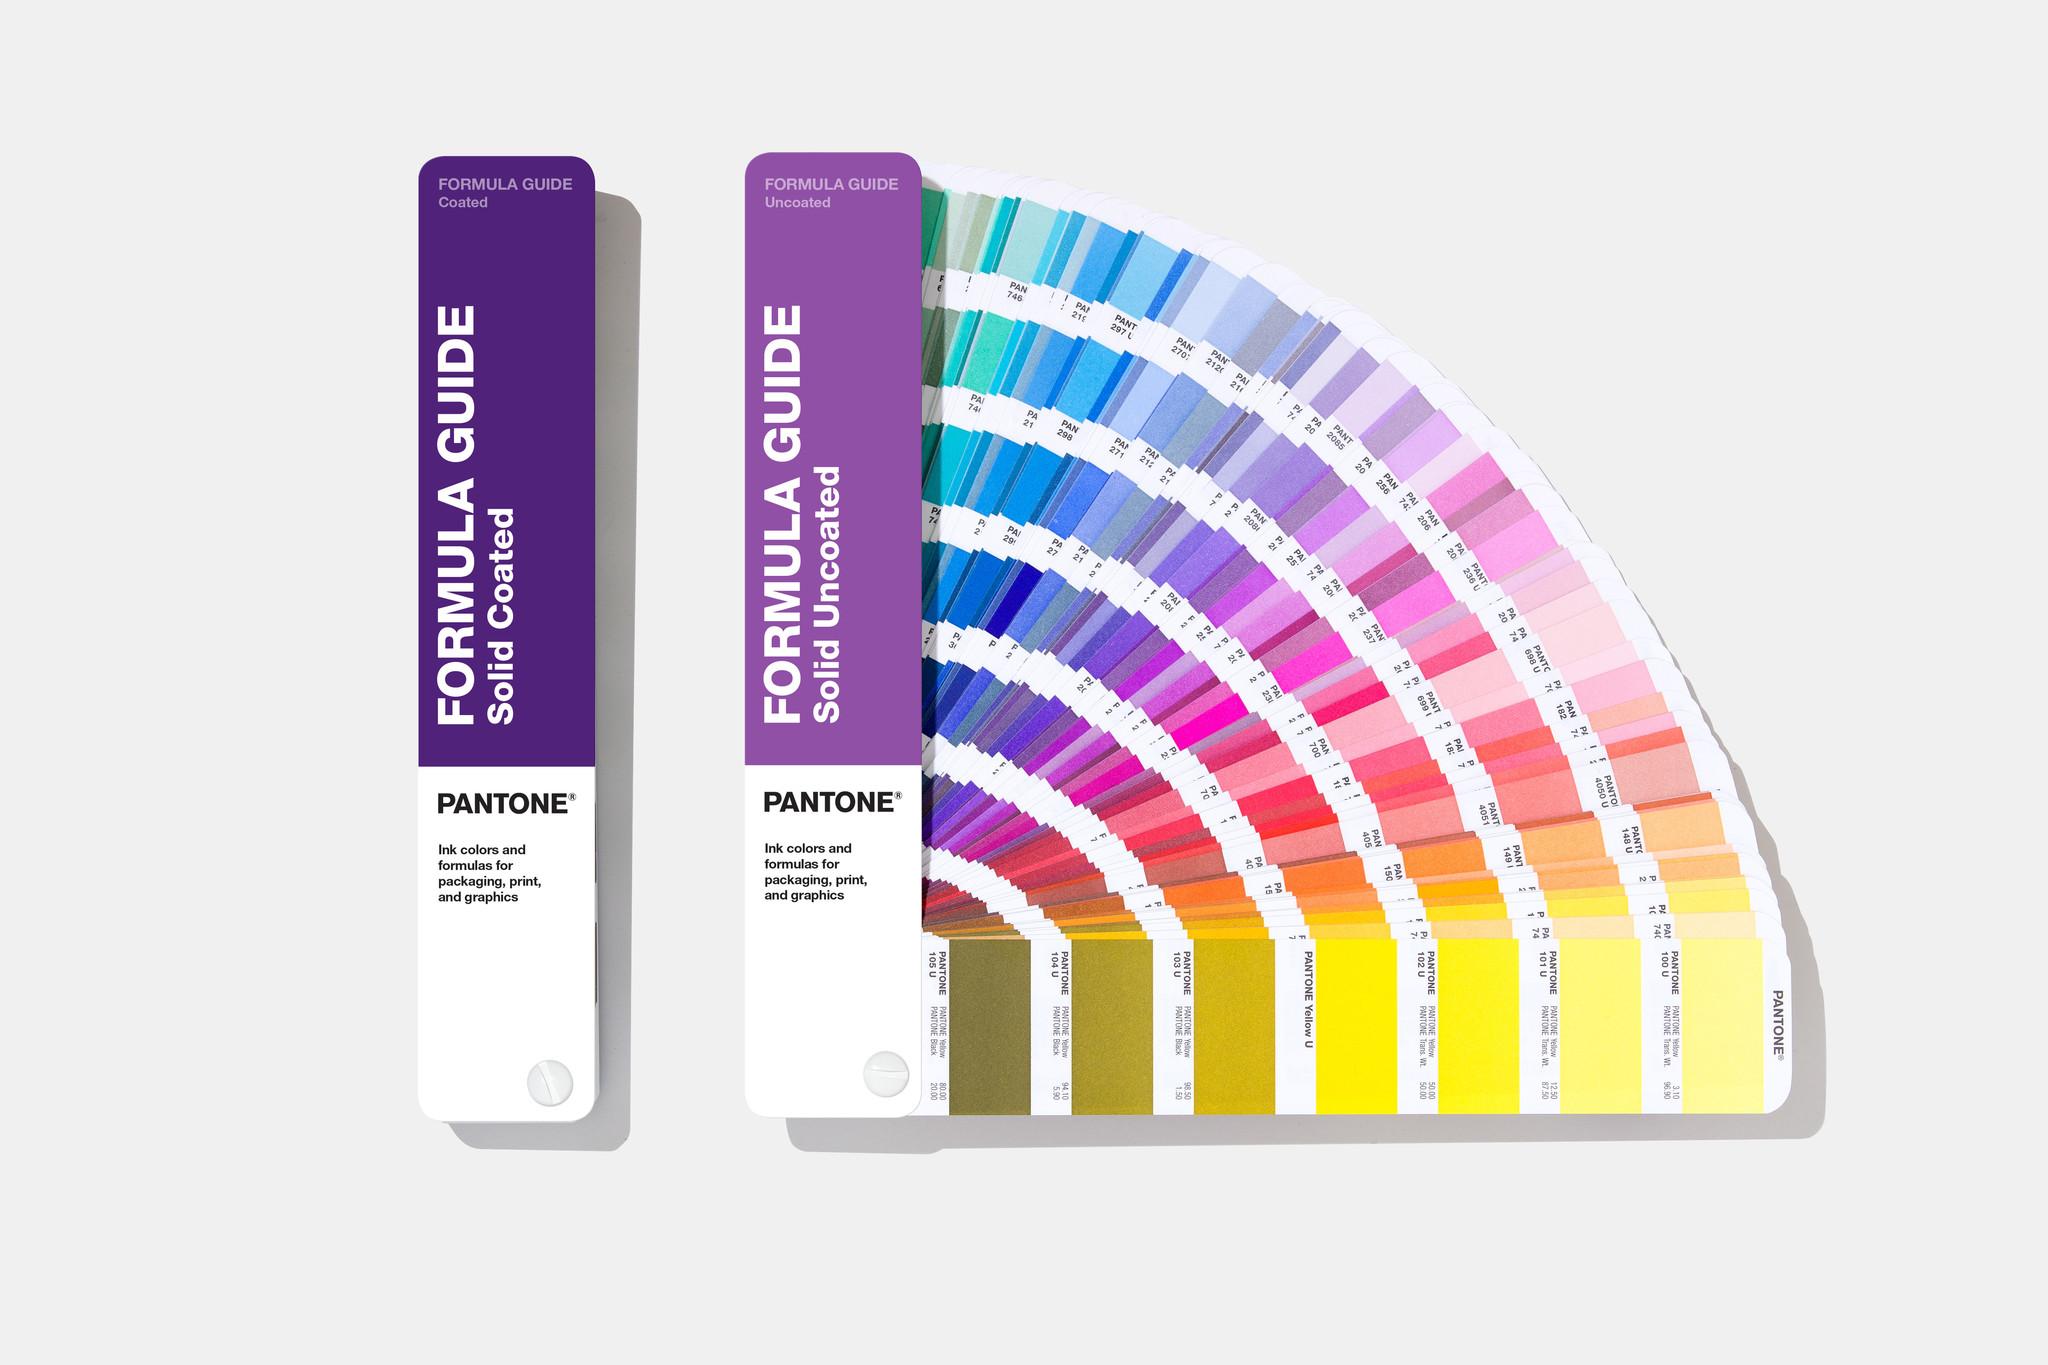 PANTONE PANTONE Formula Guide (Coated & Uncoated) - NEW 2019 colors